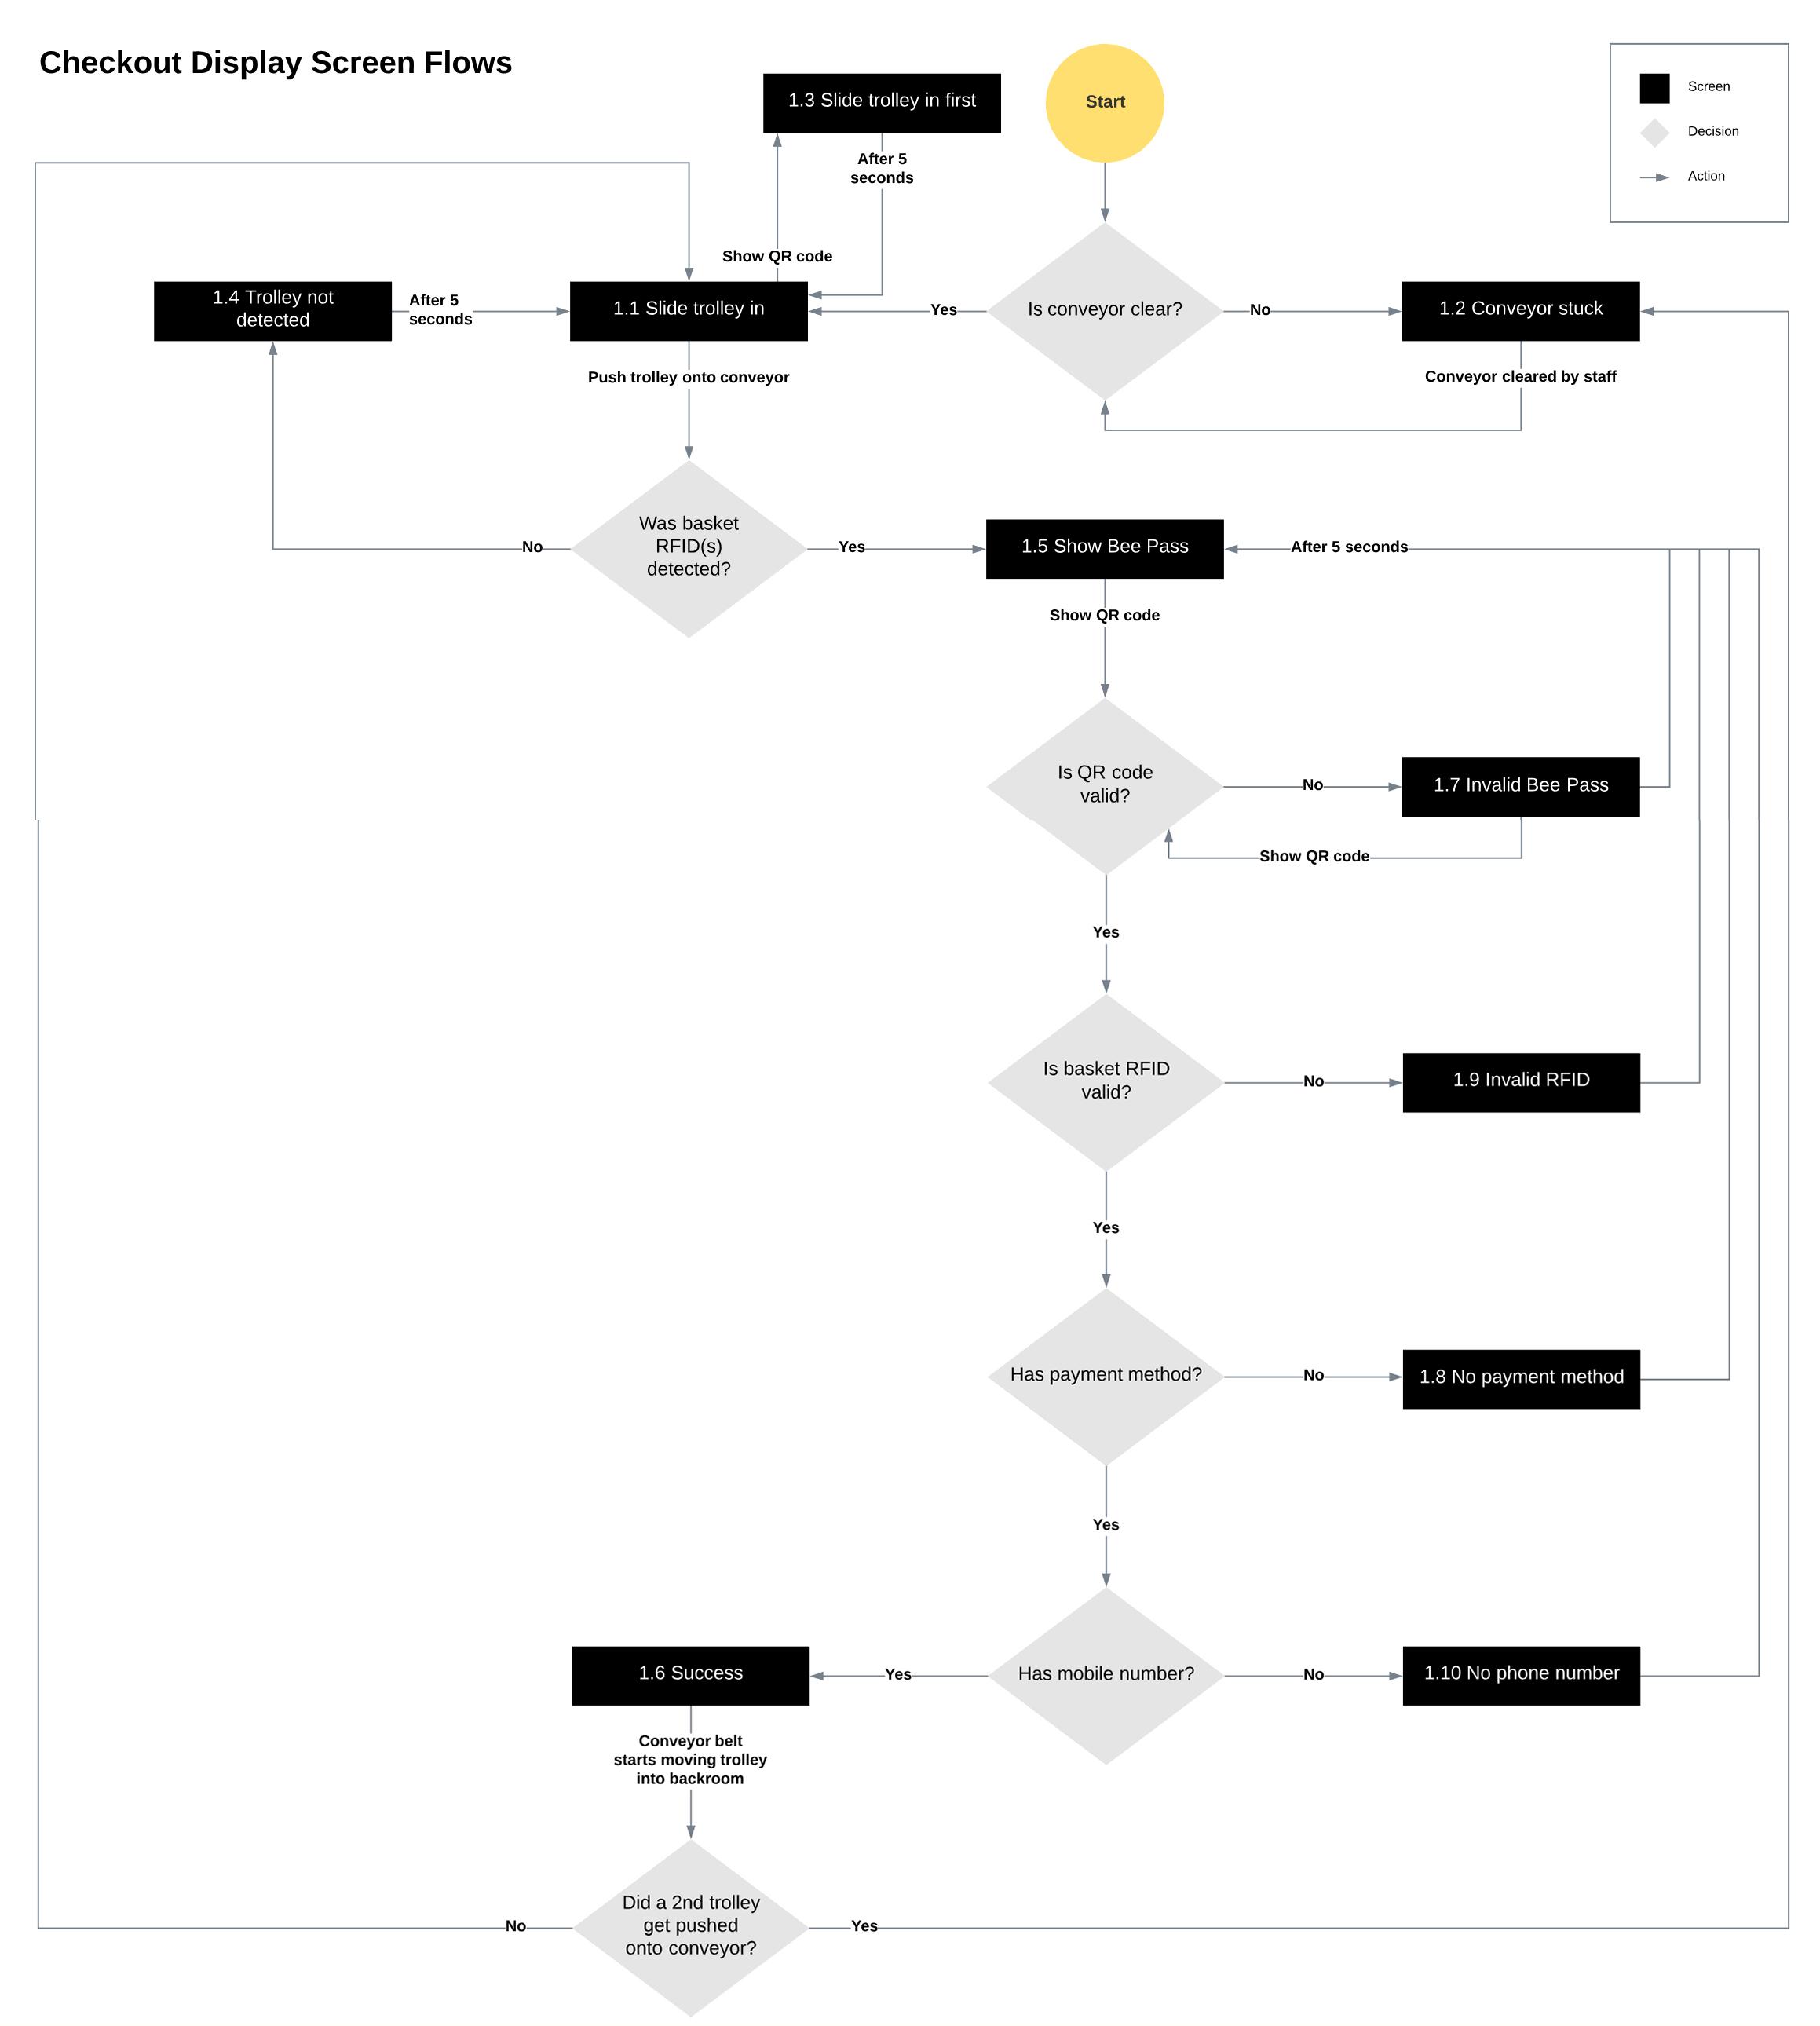 chekcoutscreen-chart.jpg